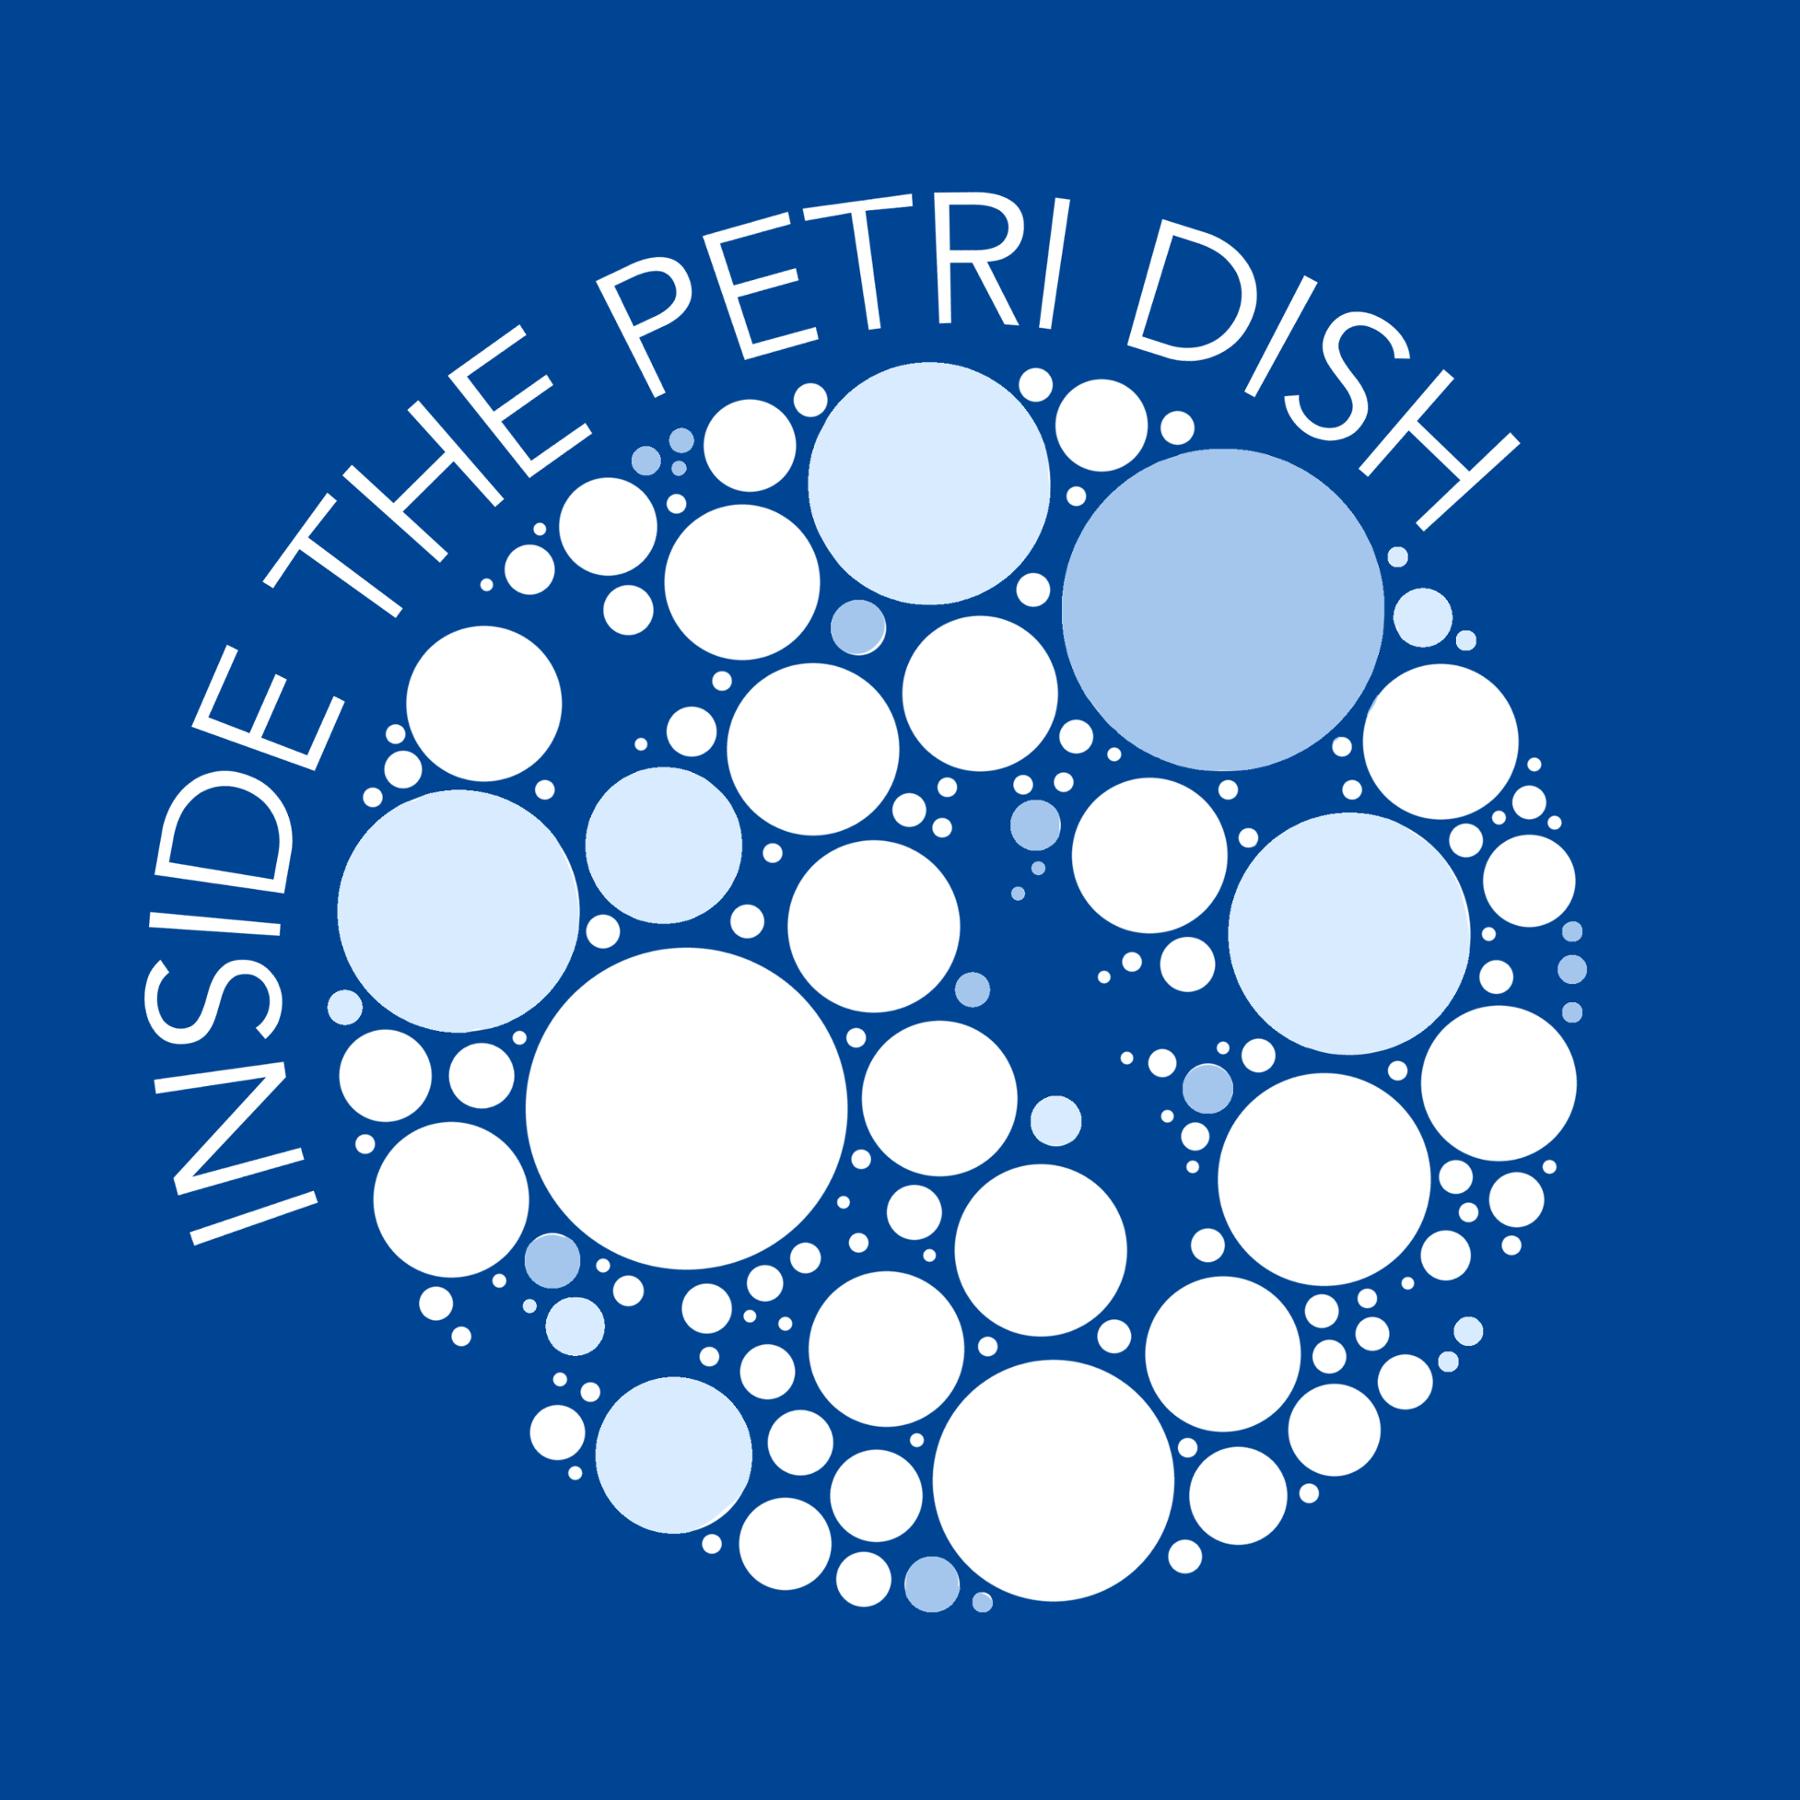 Inside The Petri Dish